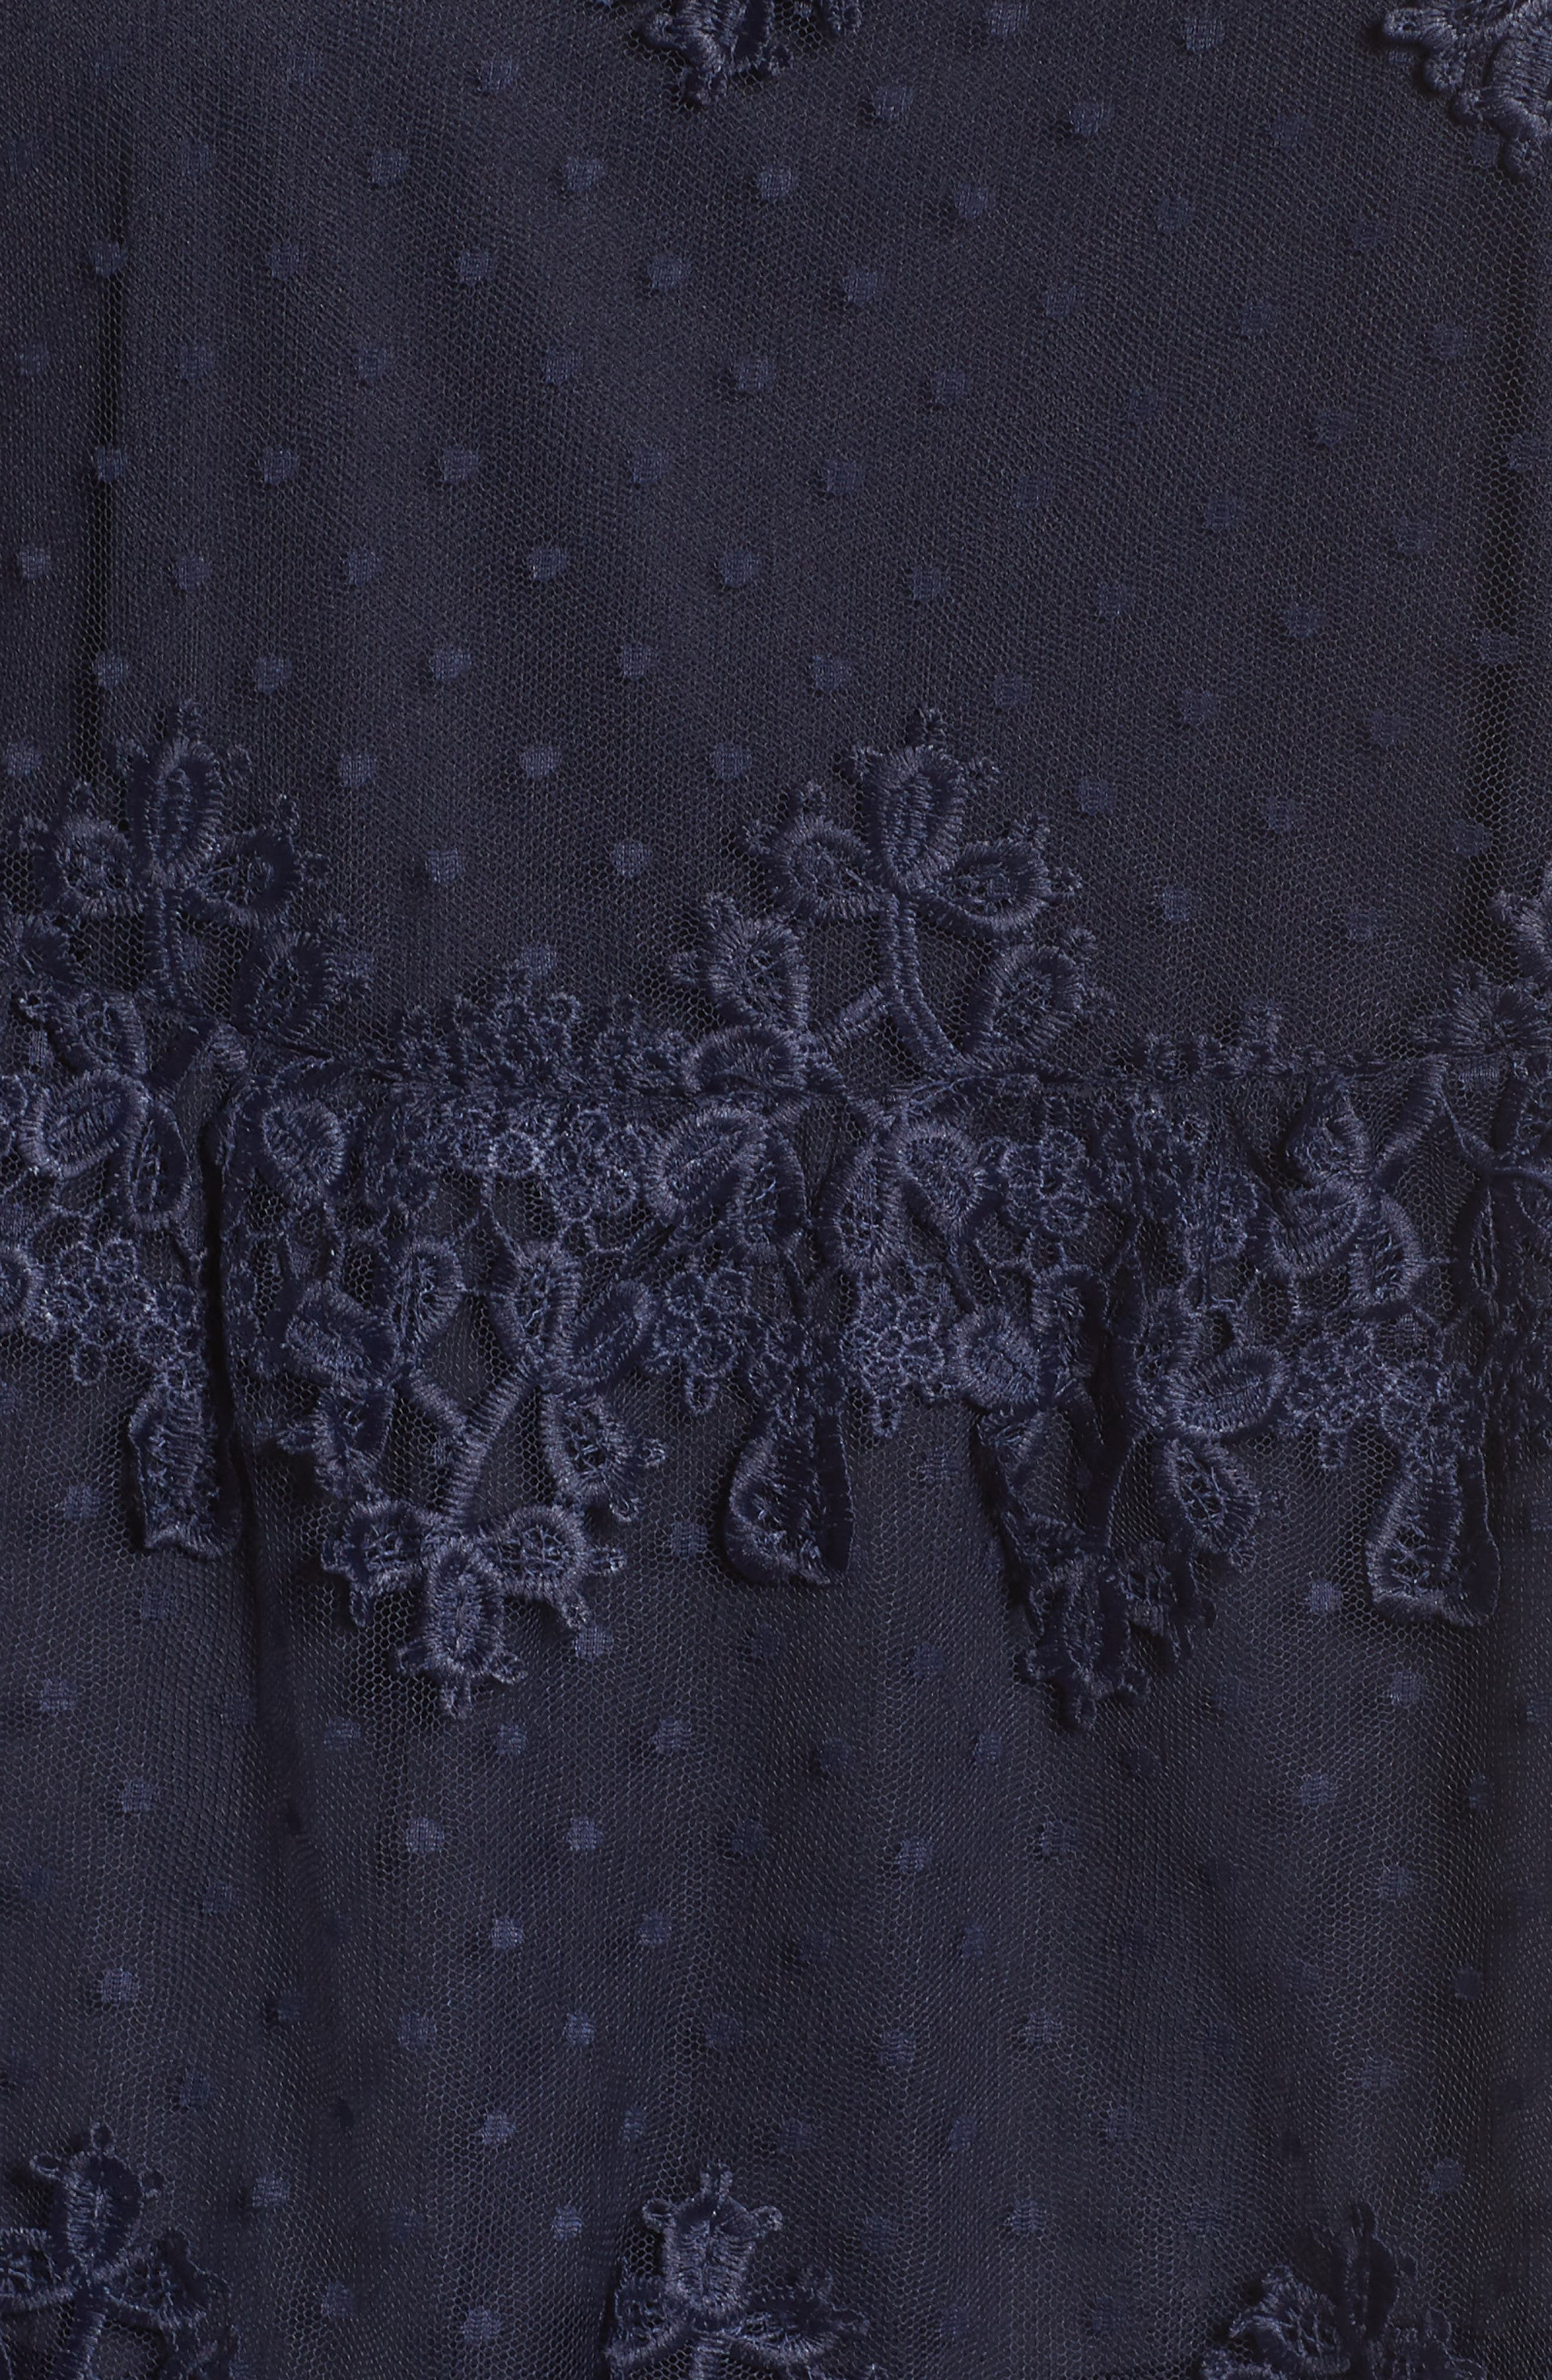 Lace Swiss Dot Swing Dress,                             Alternate thumbnail 6, color,                             Navy